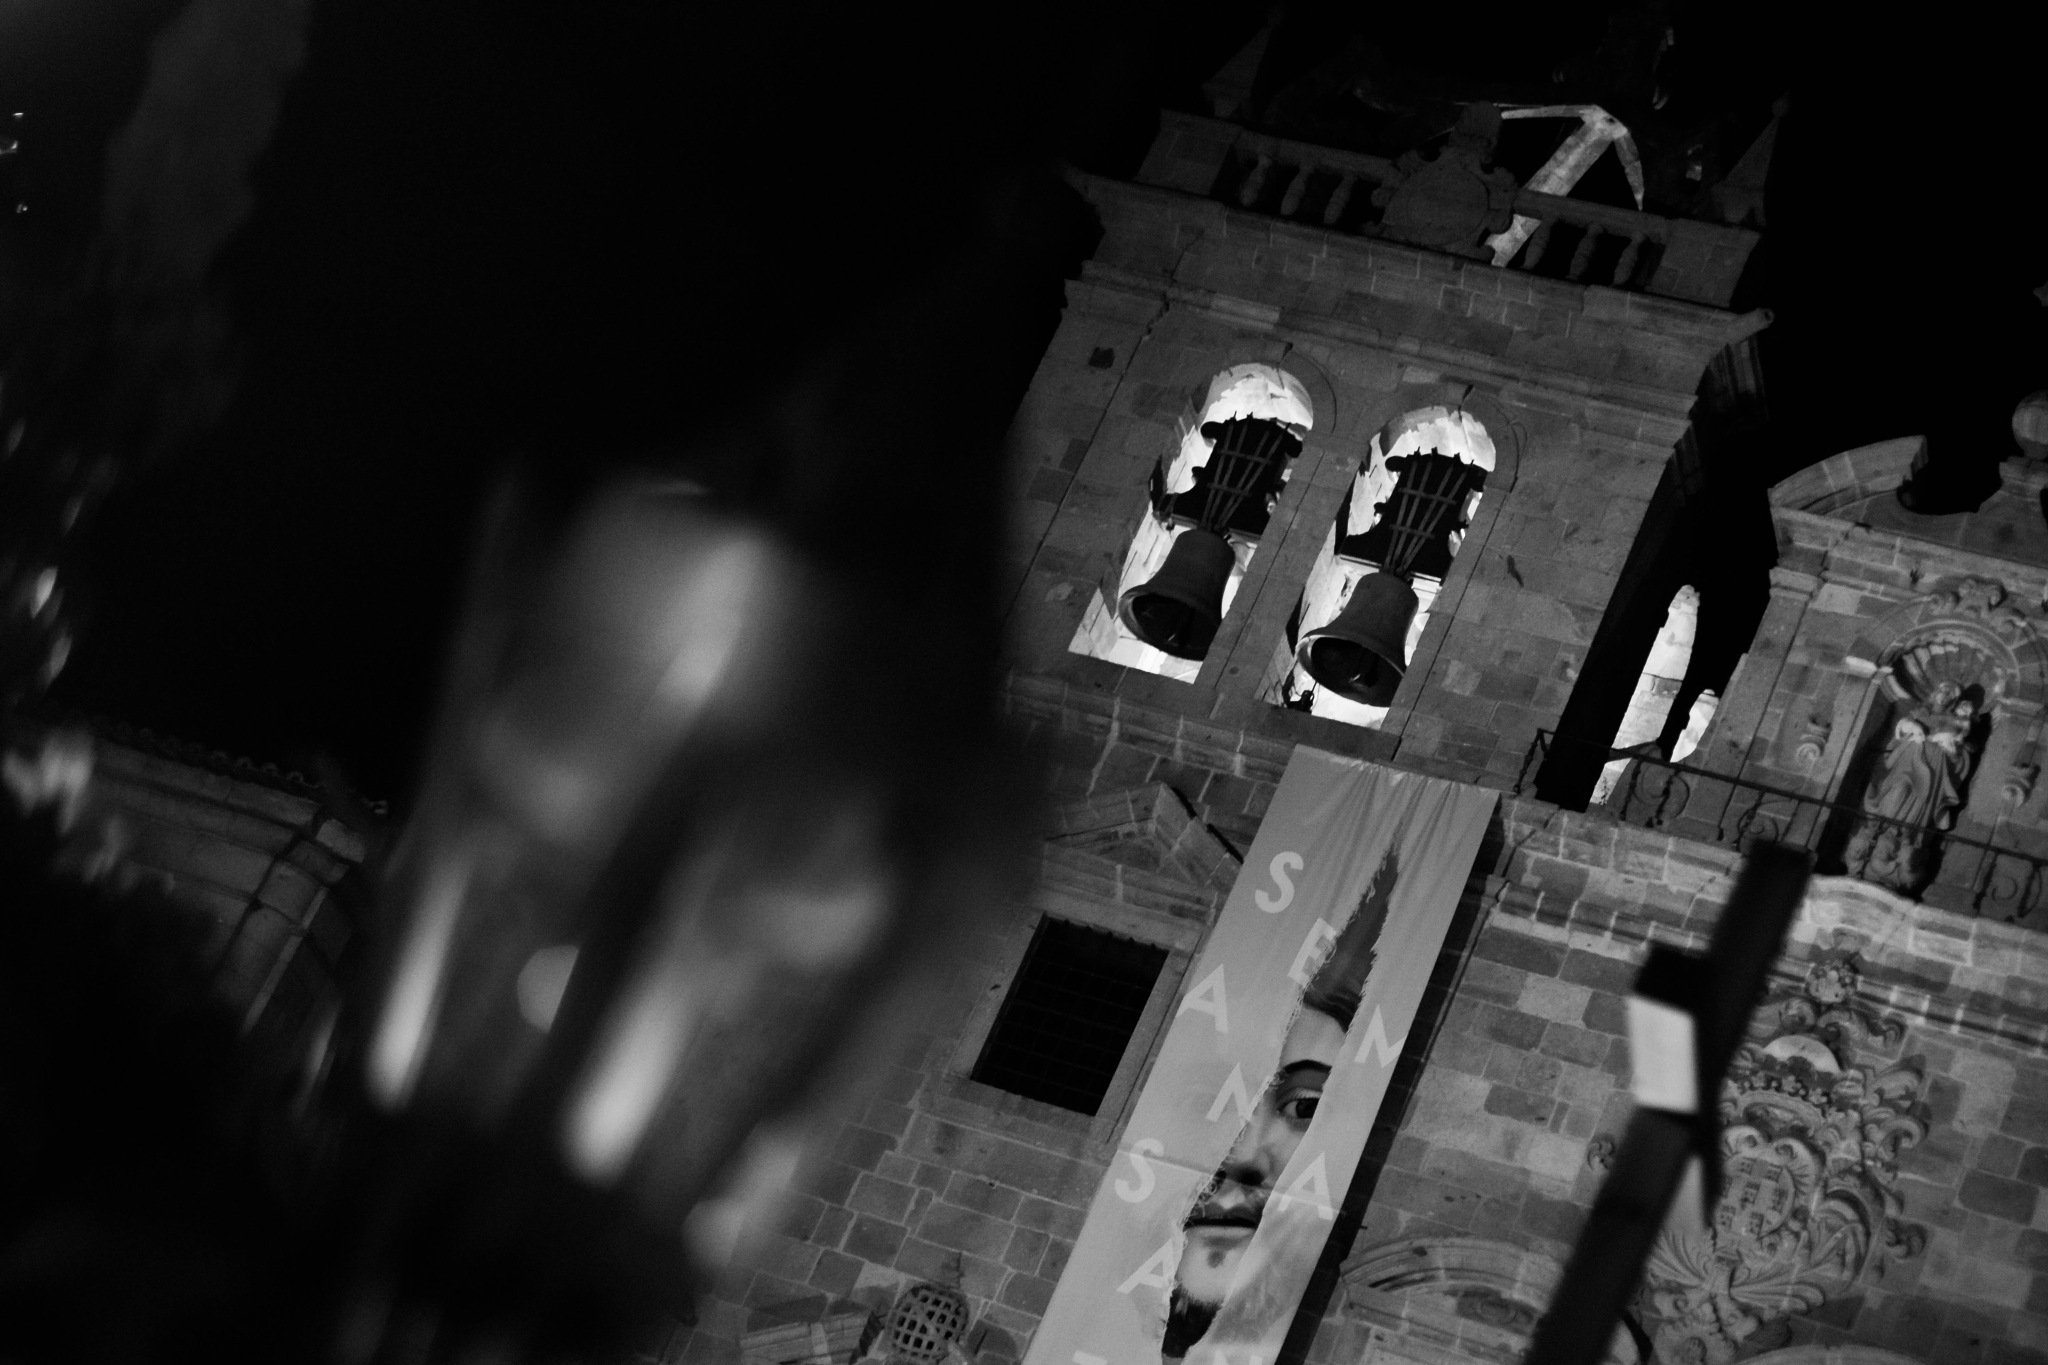 Stalking the churchyard by luisMartins